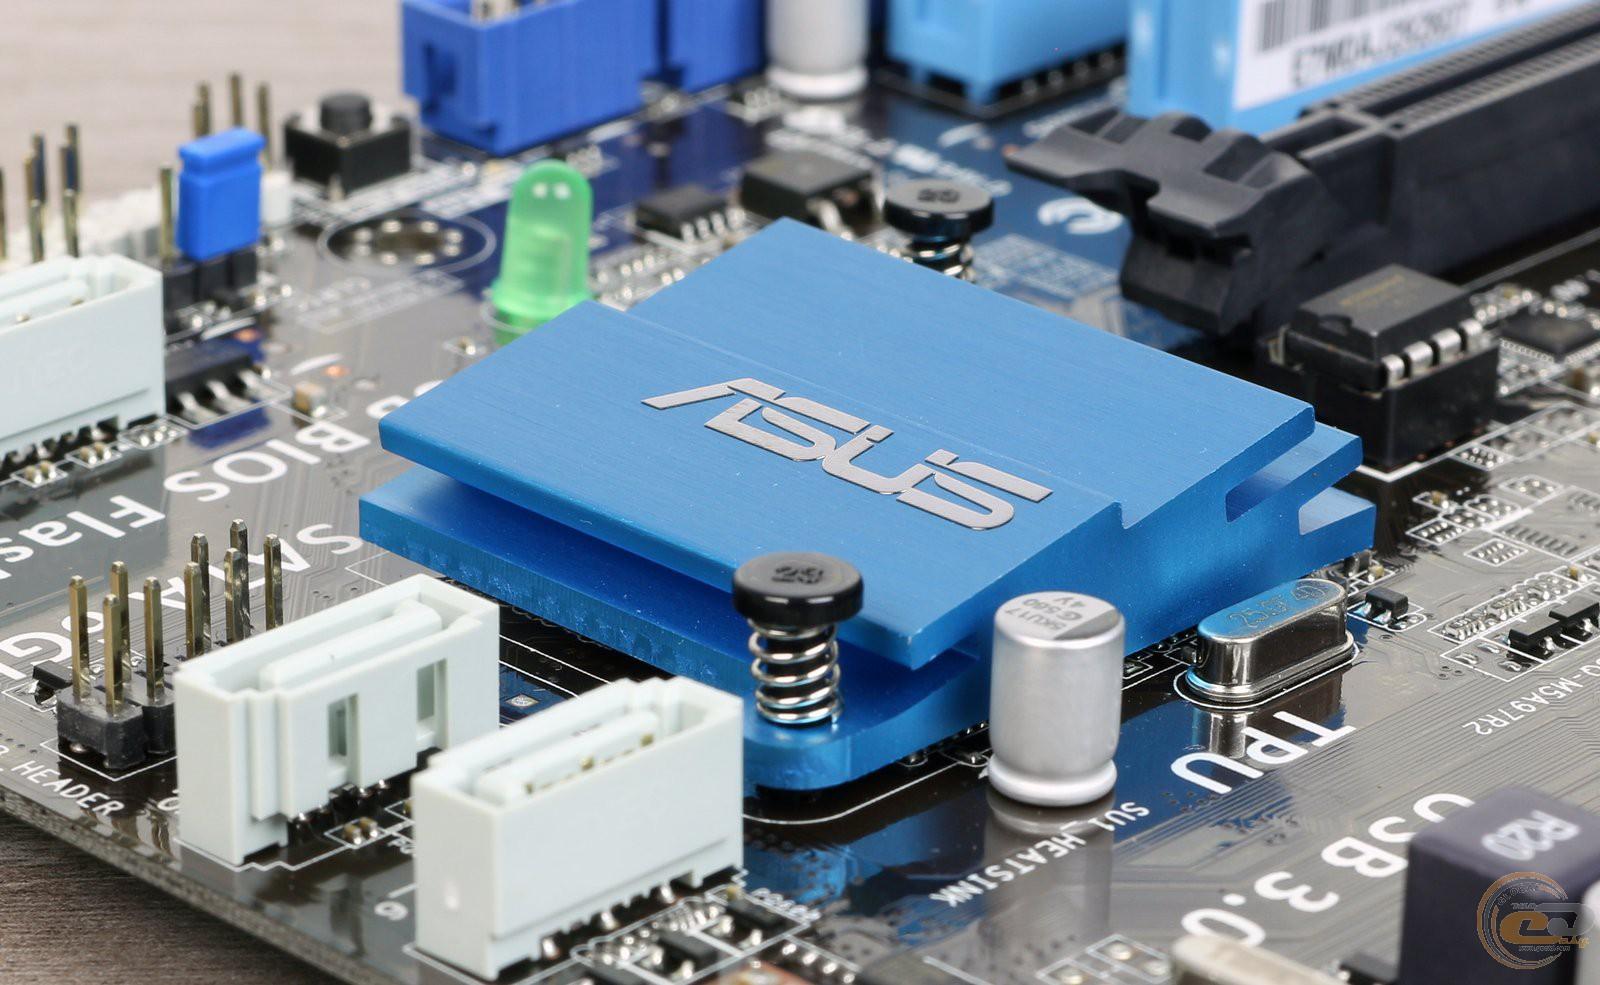 ASUS M5A97 R2.0 AMD CHIPSET DRIVER WINDOWS XP